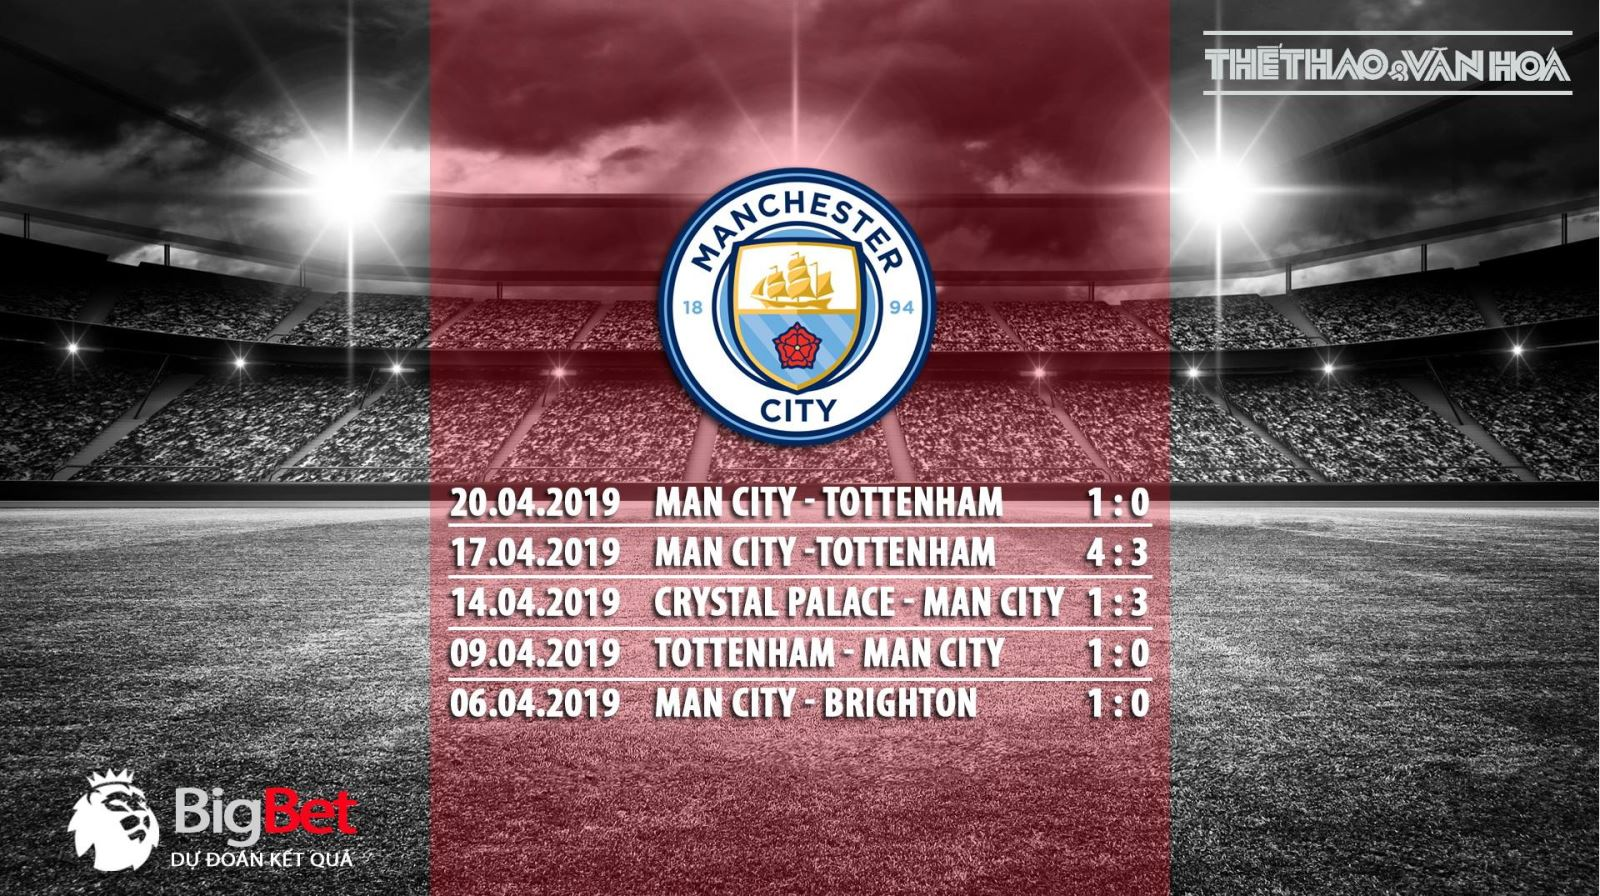 soi kèo MU vs Man City, MU, Man City, trực tiếp MU vs Man City, trực tiếp bóng đá, dự đoán MU vs Man City